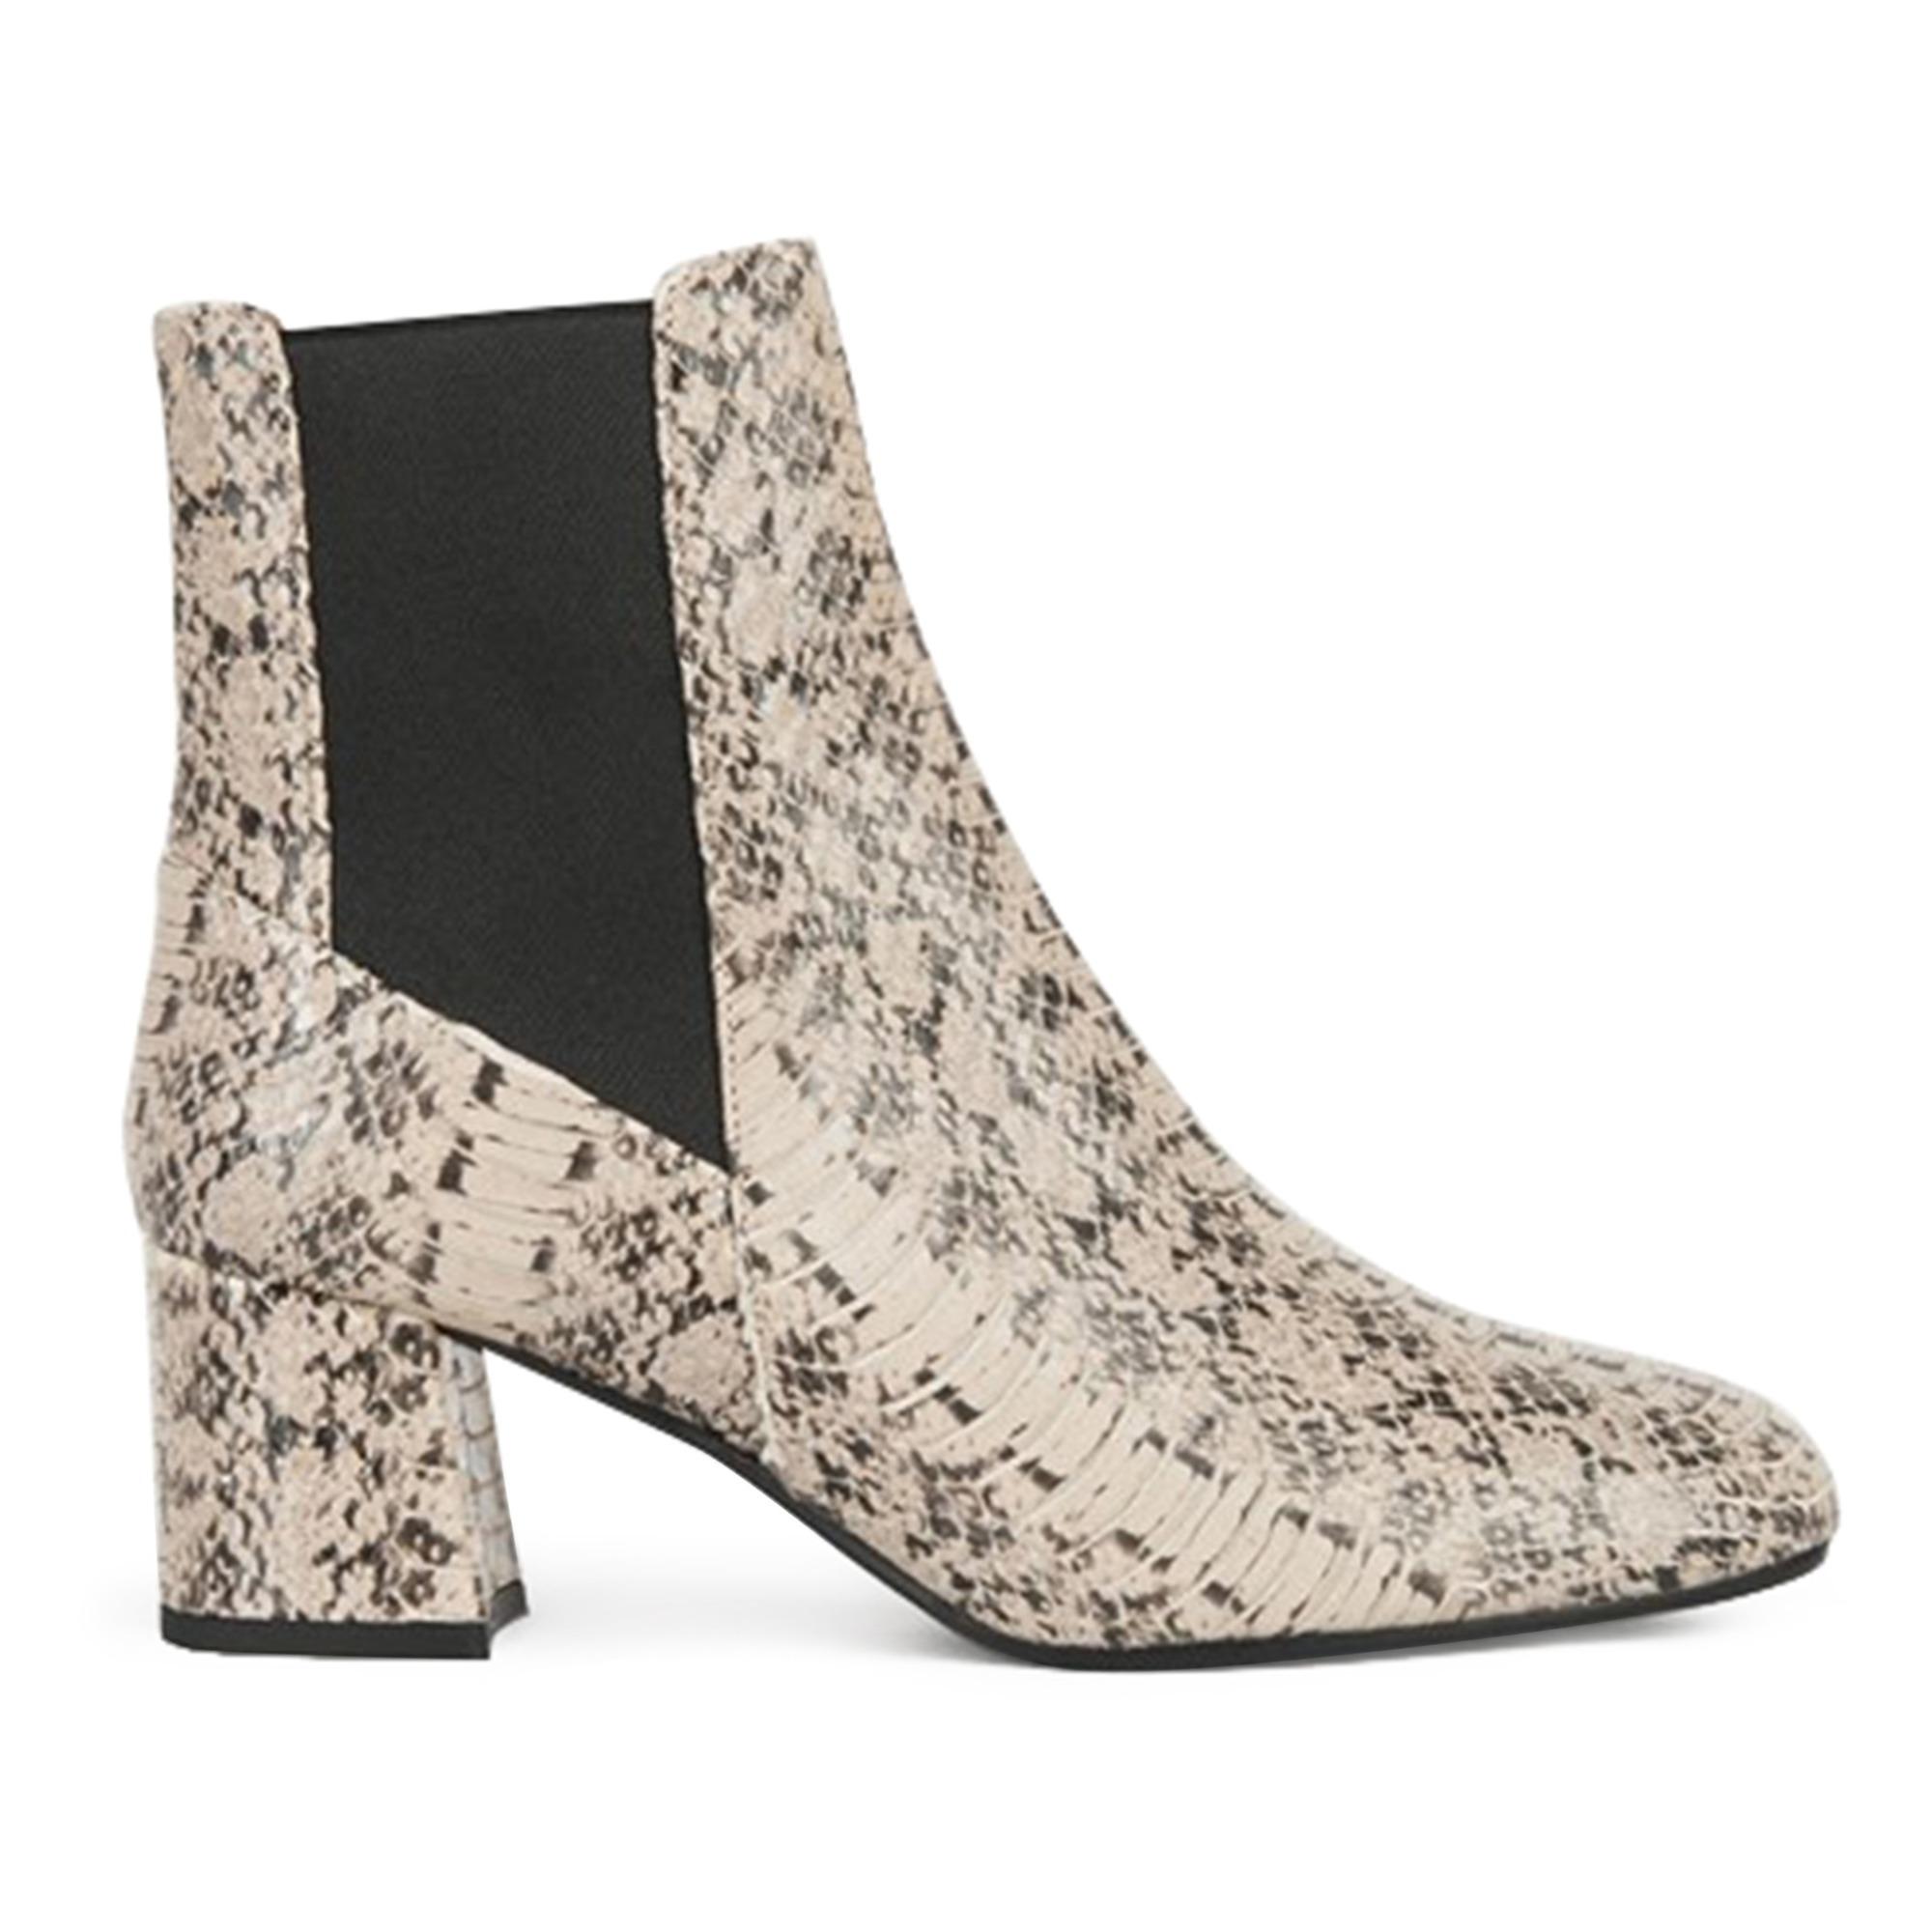 Boots Altea